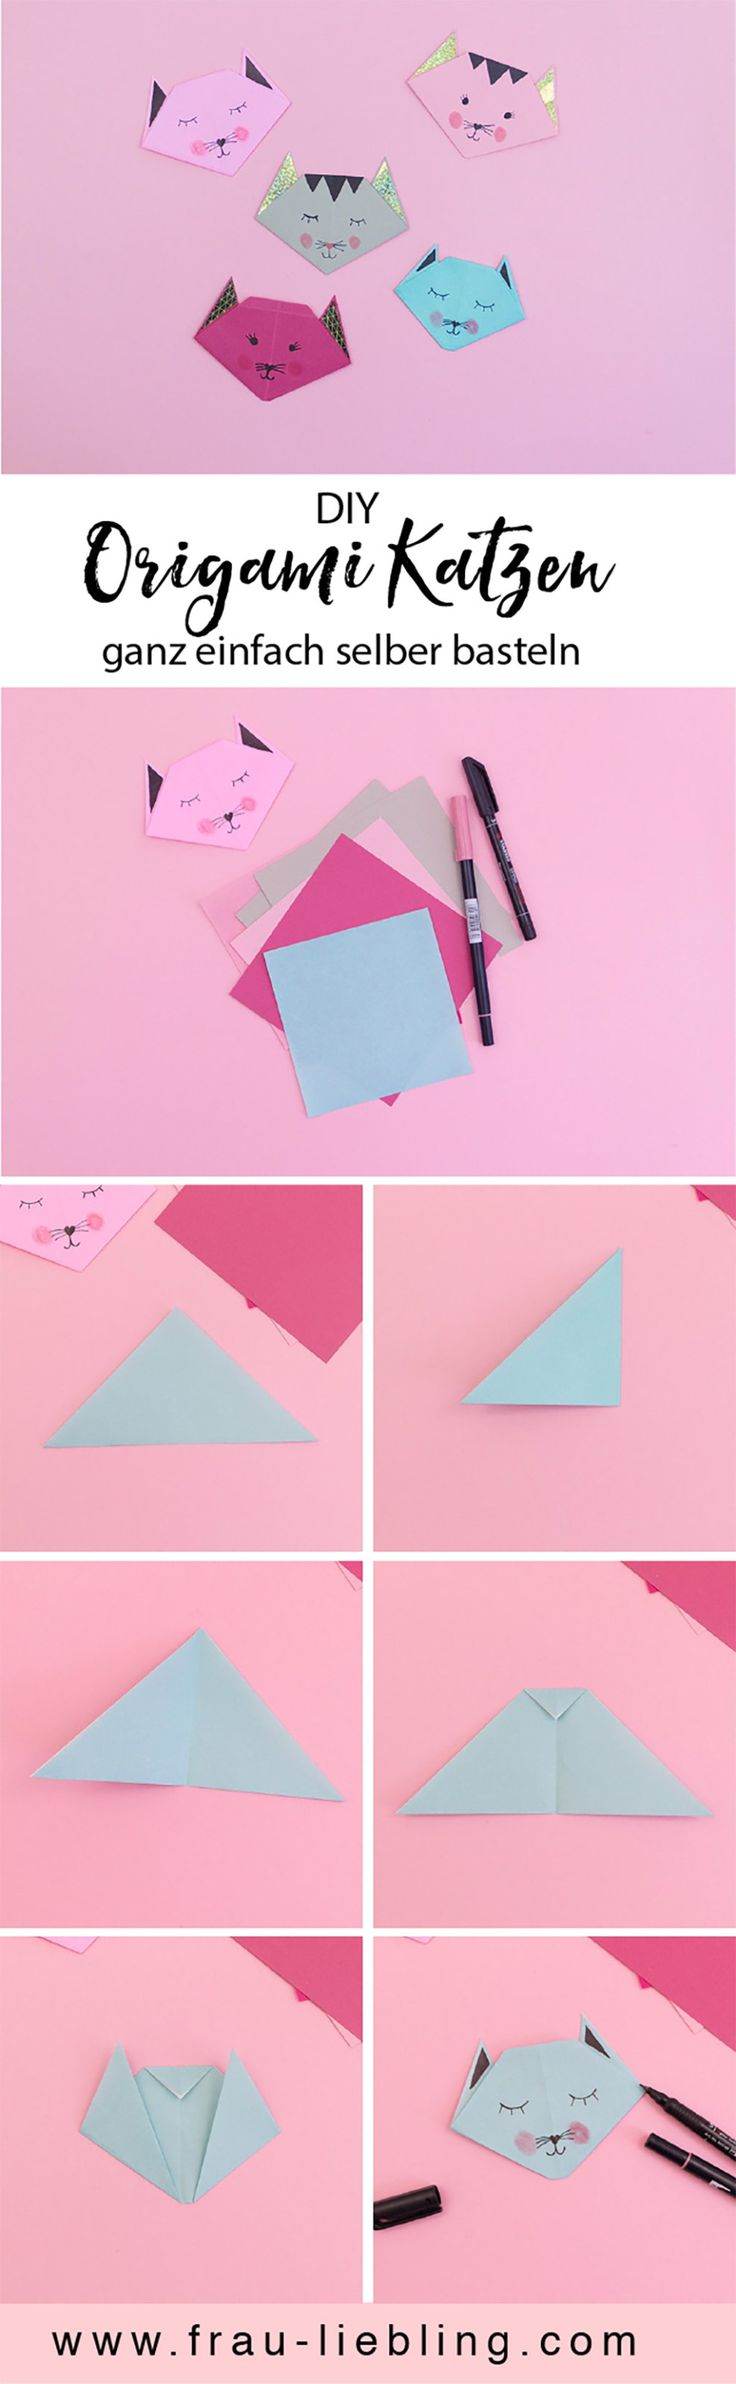 DIY Deko: Origami Katzen als Wanddeko und Geschenkidee basteln